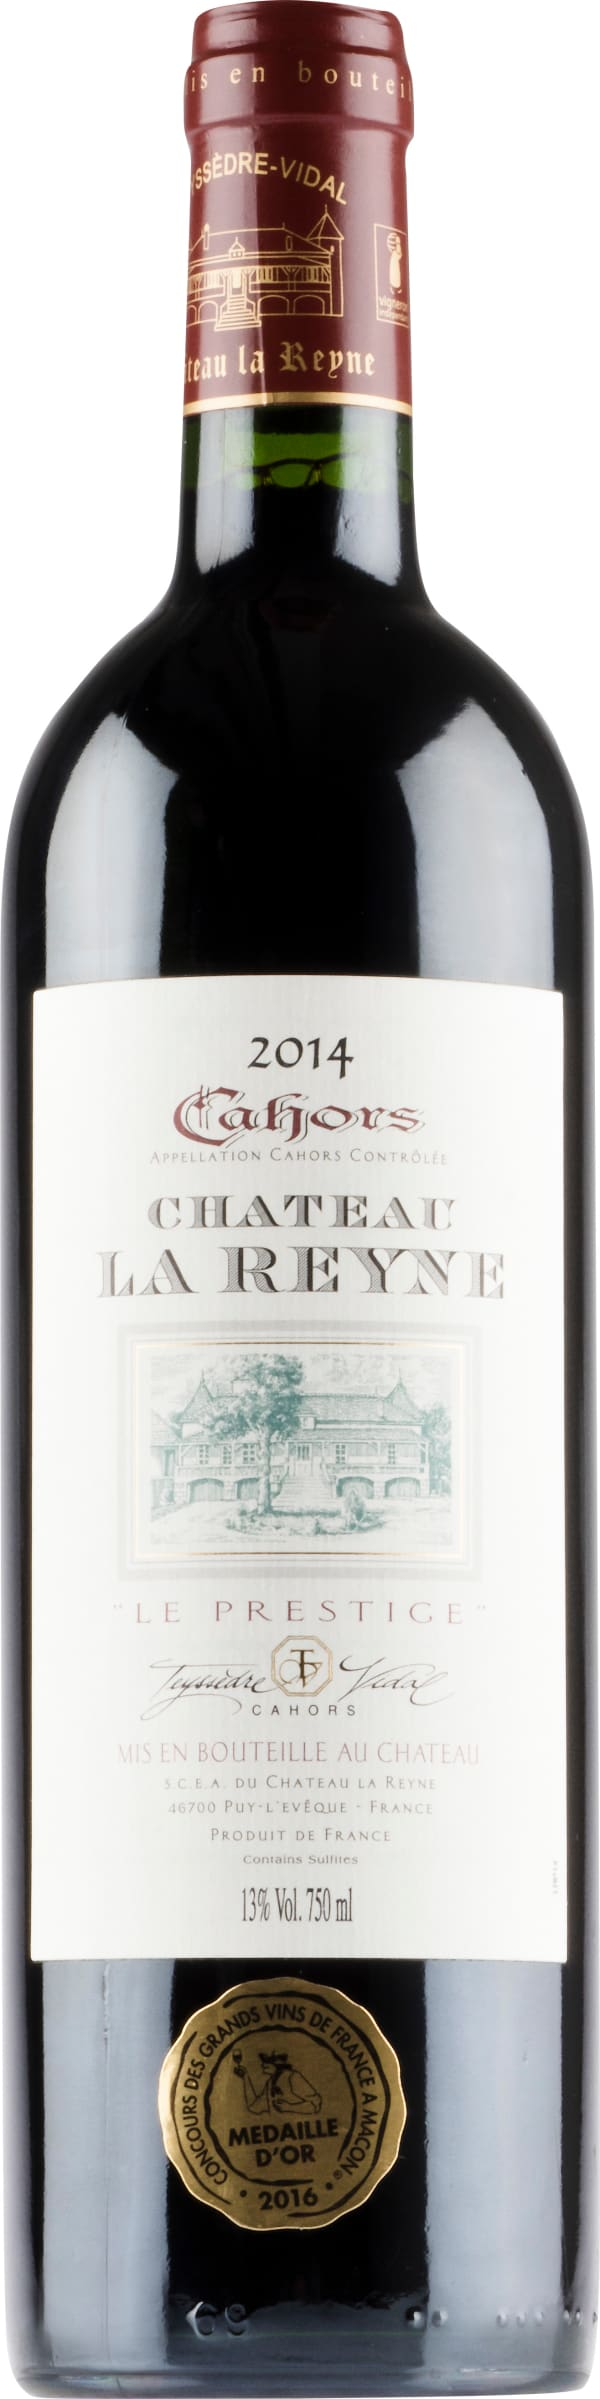 Château la Reyne Le Prestige 2014